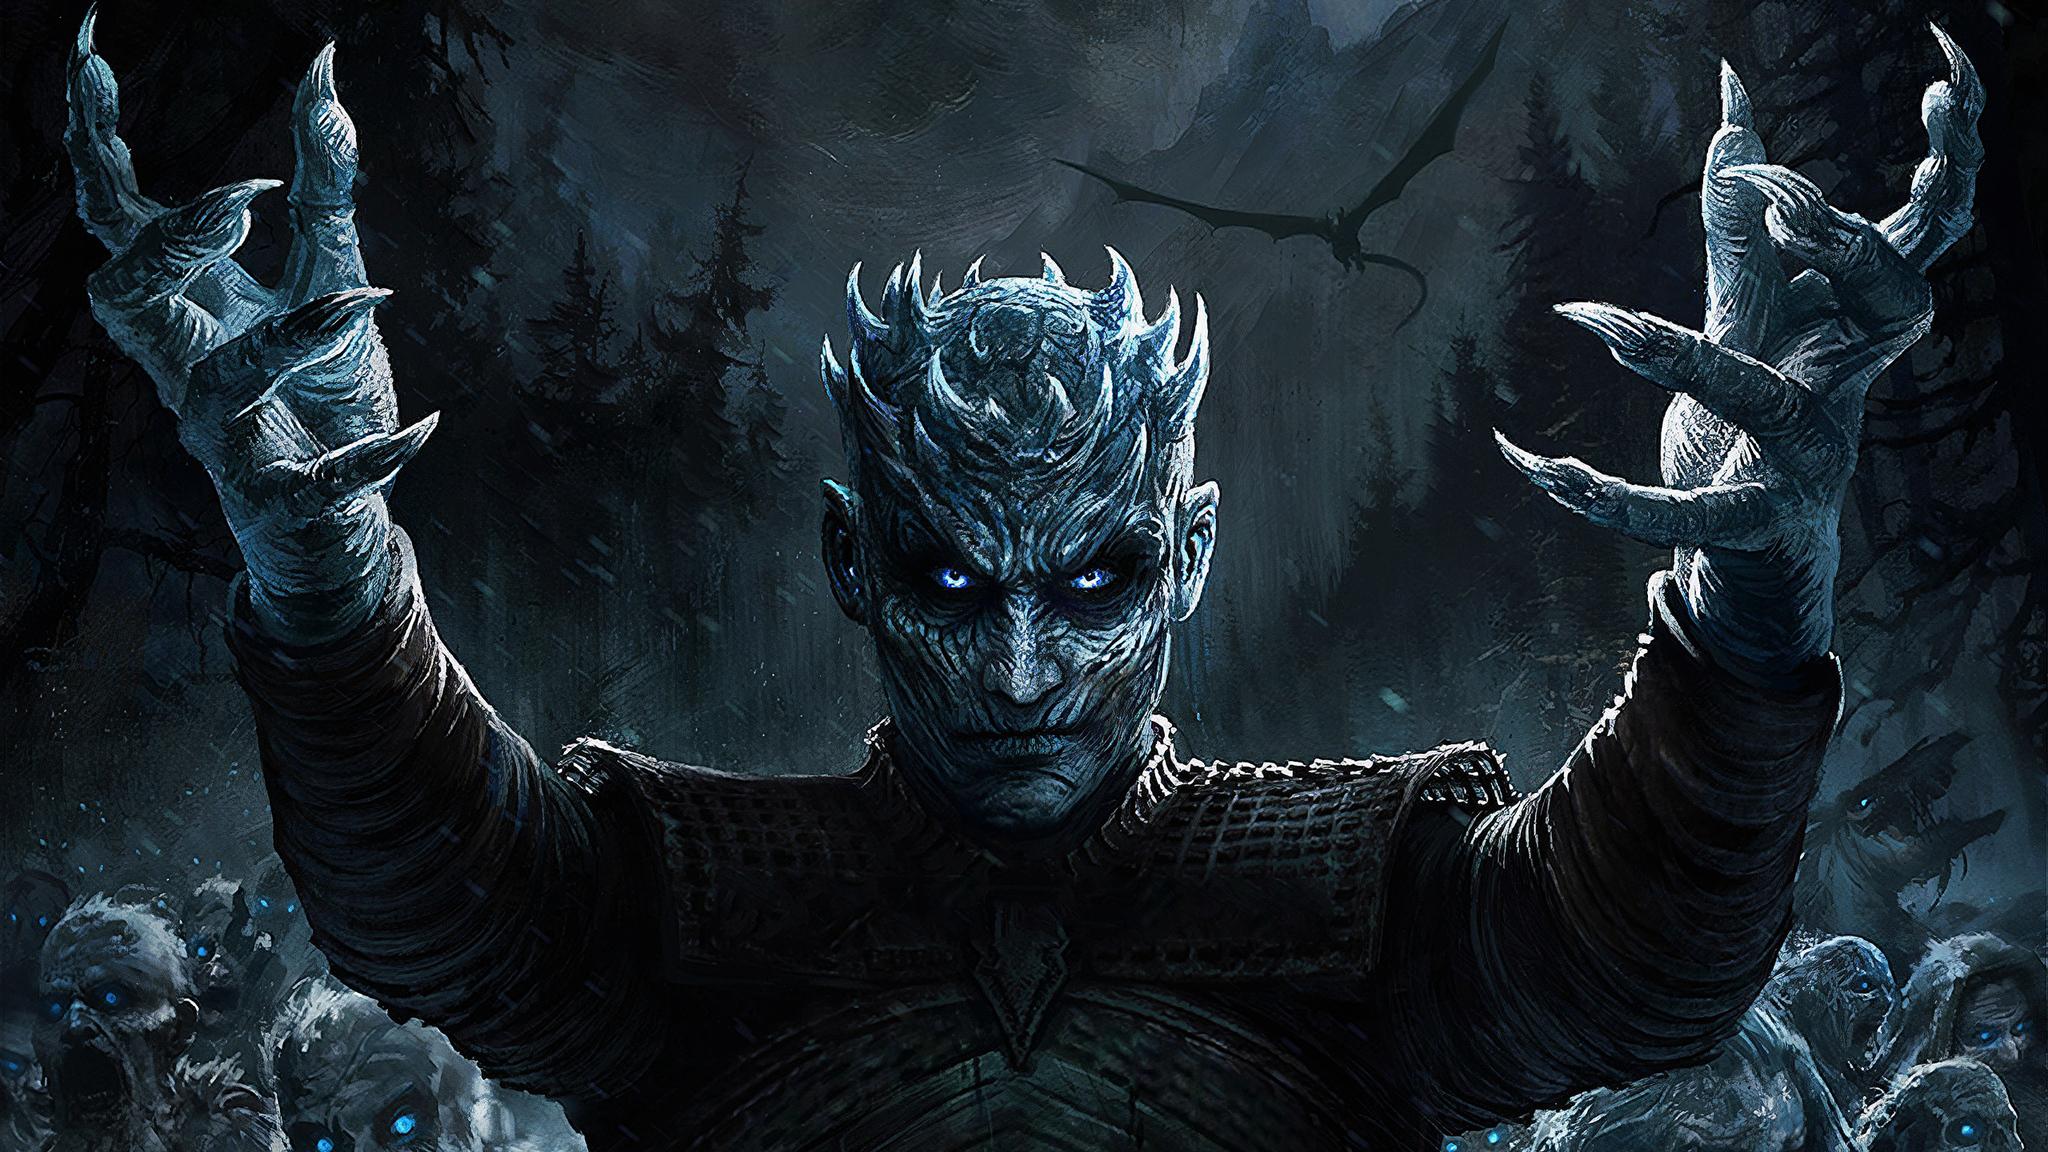 night-king-game-of-thrones-season-8-art-ov.jpg